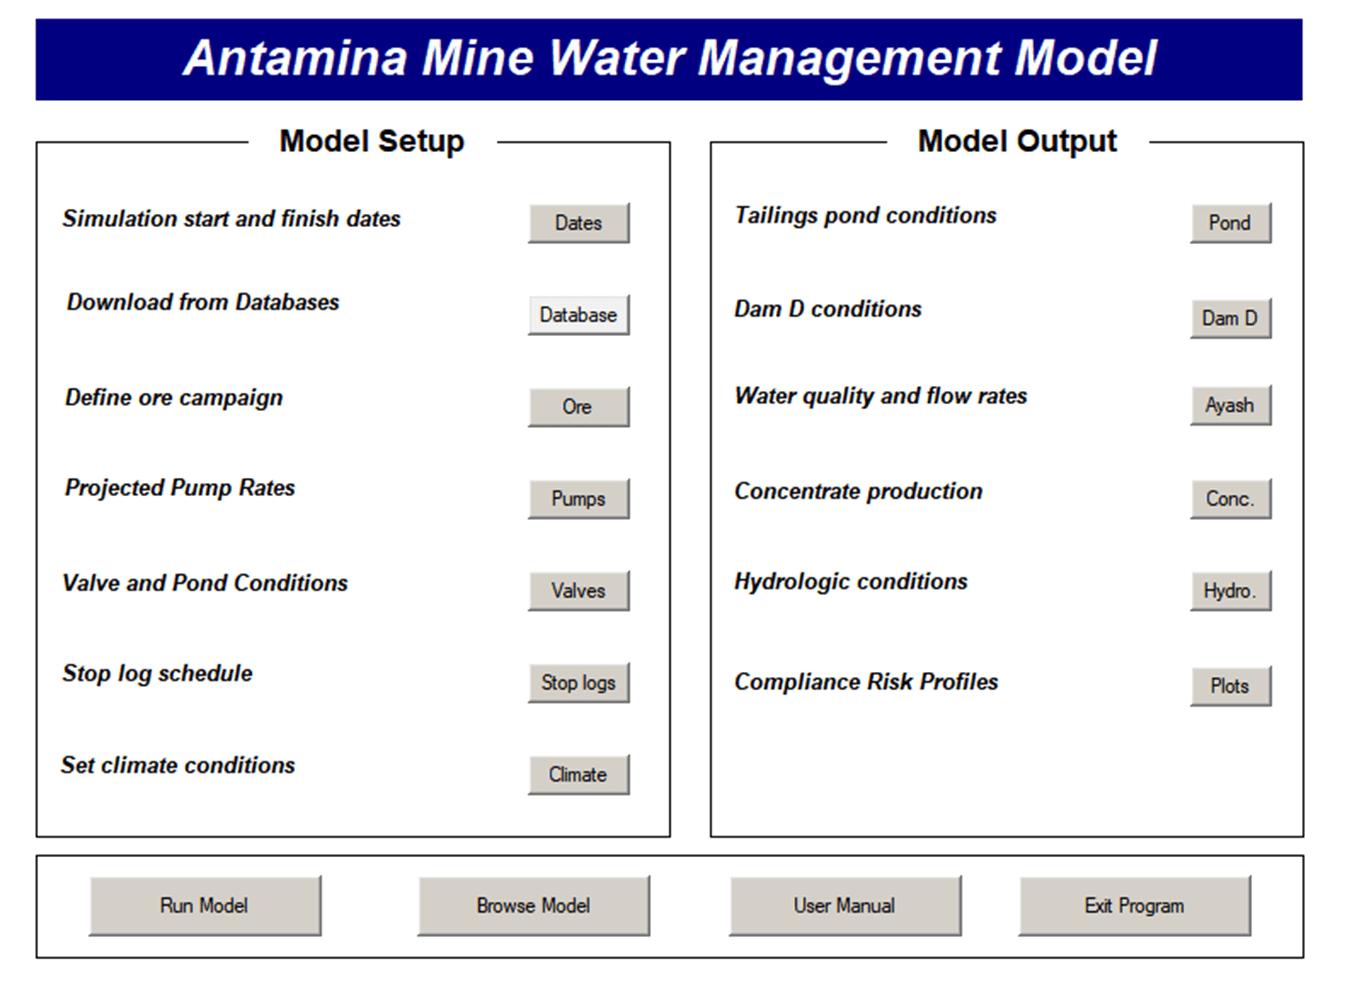 Antamina Mine Operation Simulation Model User Interface